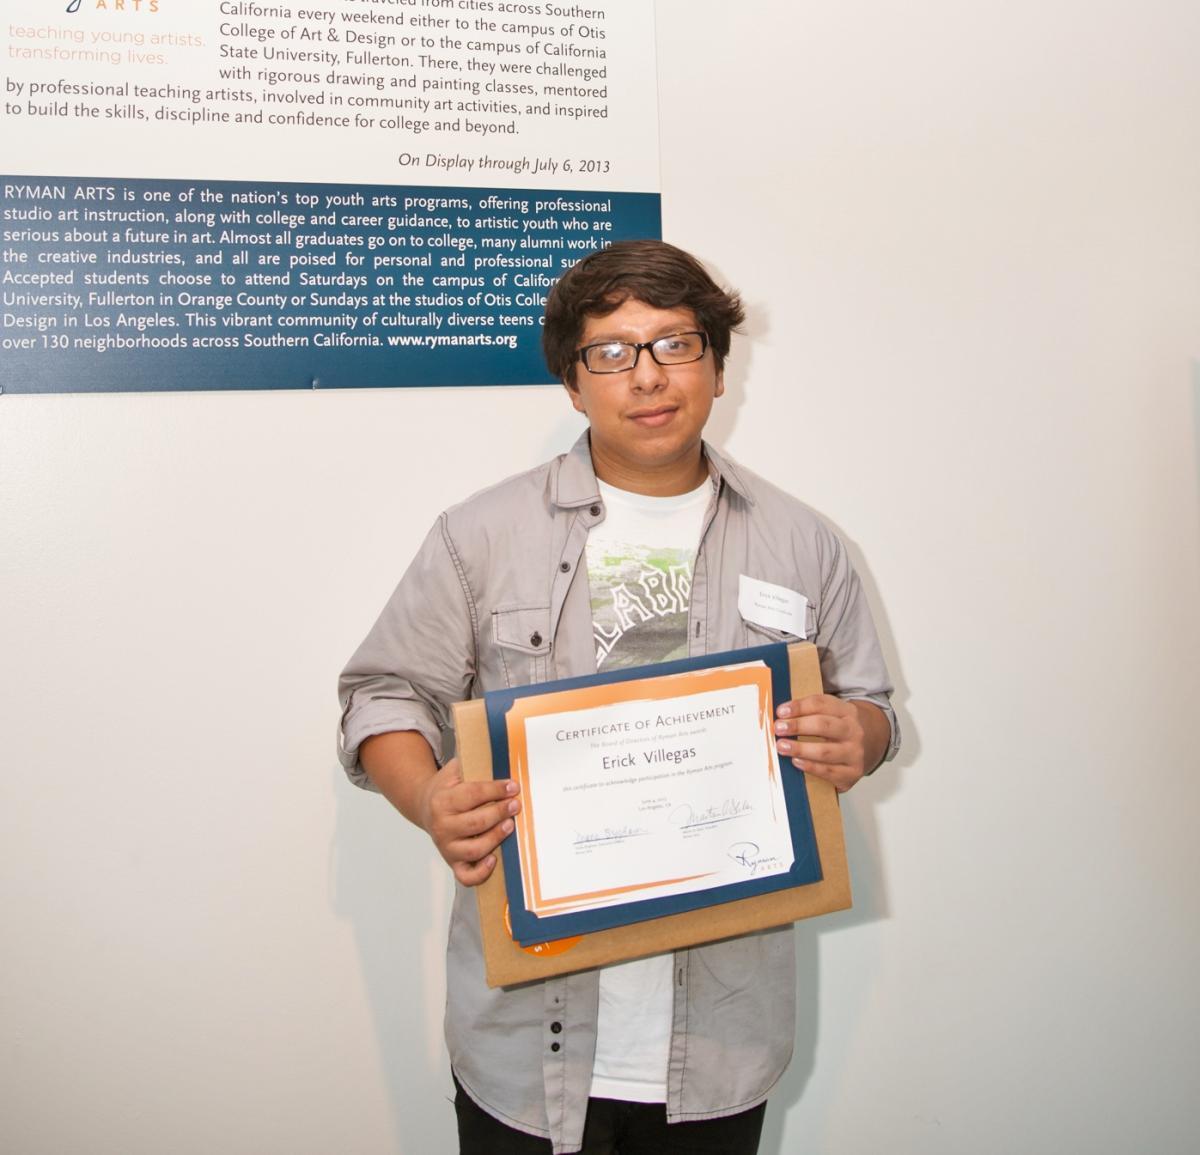 TEA Buzz Price Student Award Erick Villegas (Ryman '13)